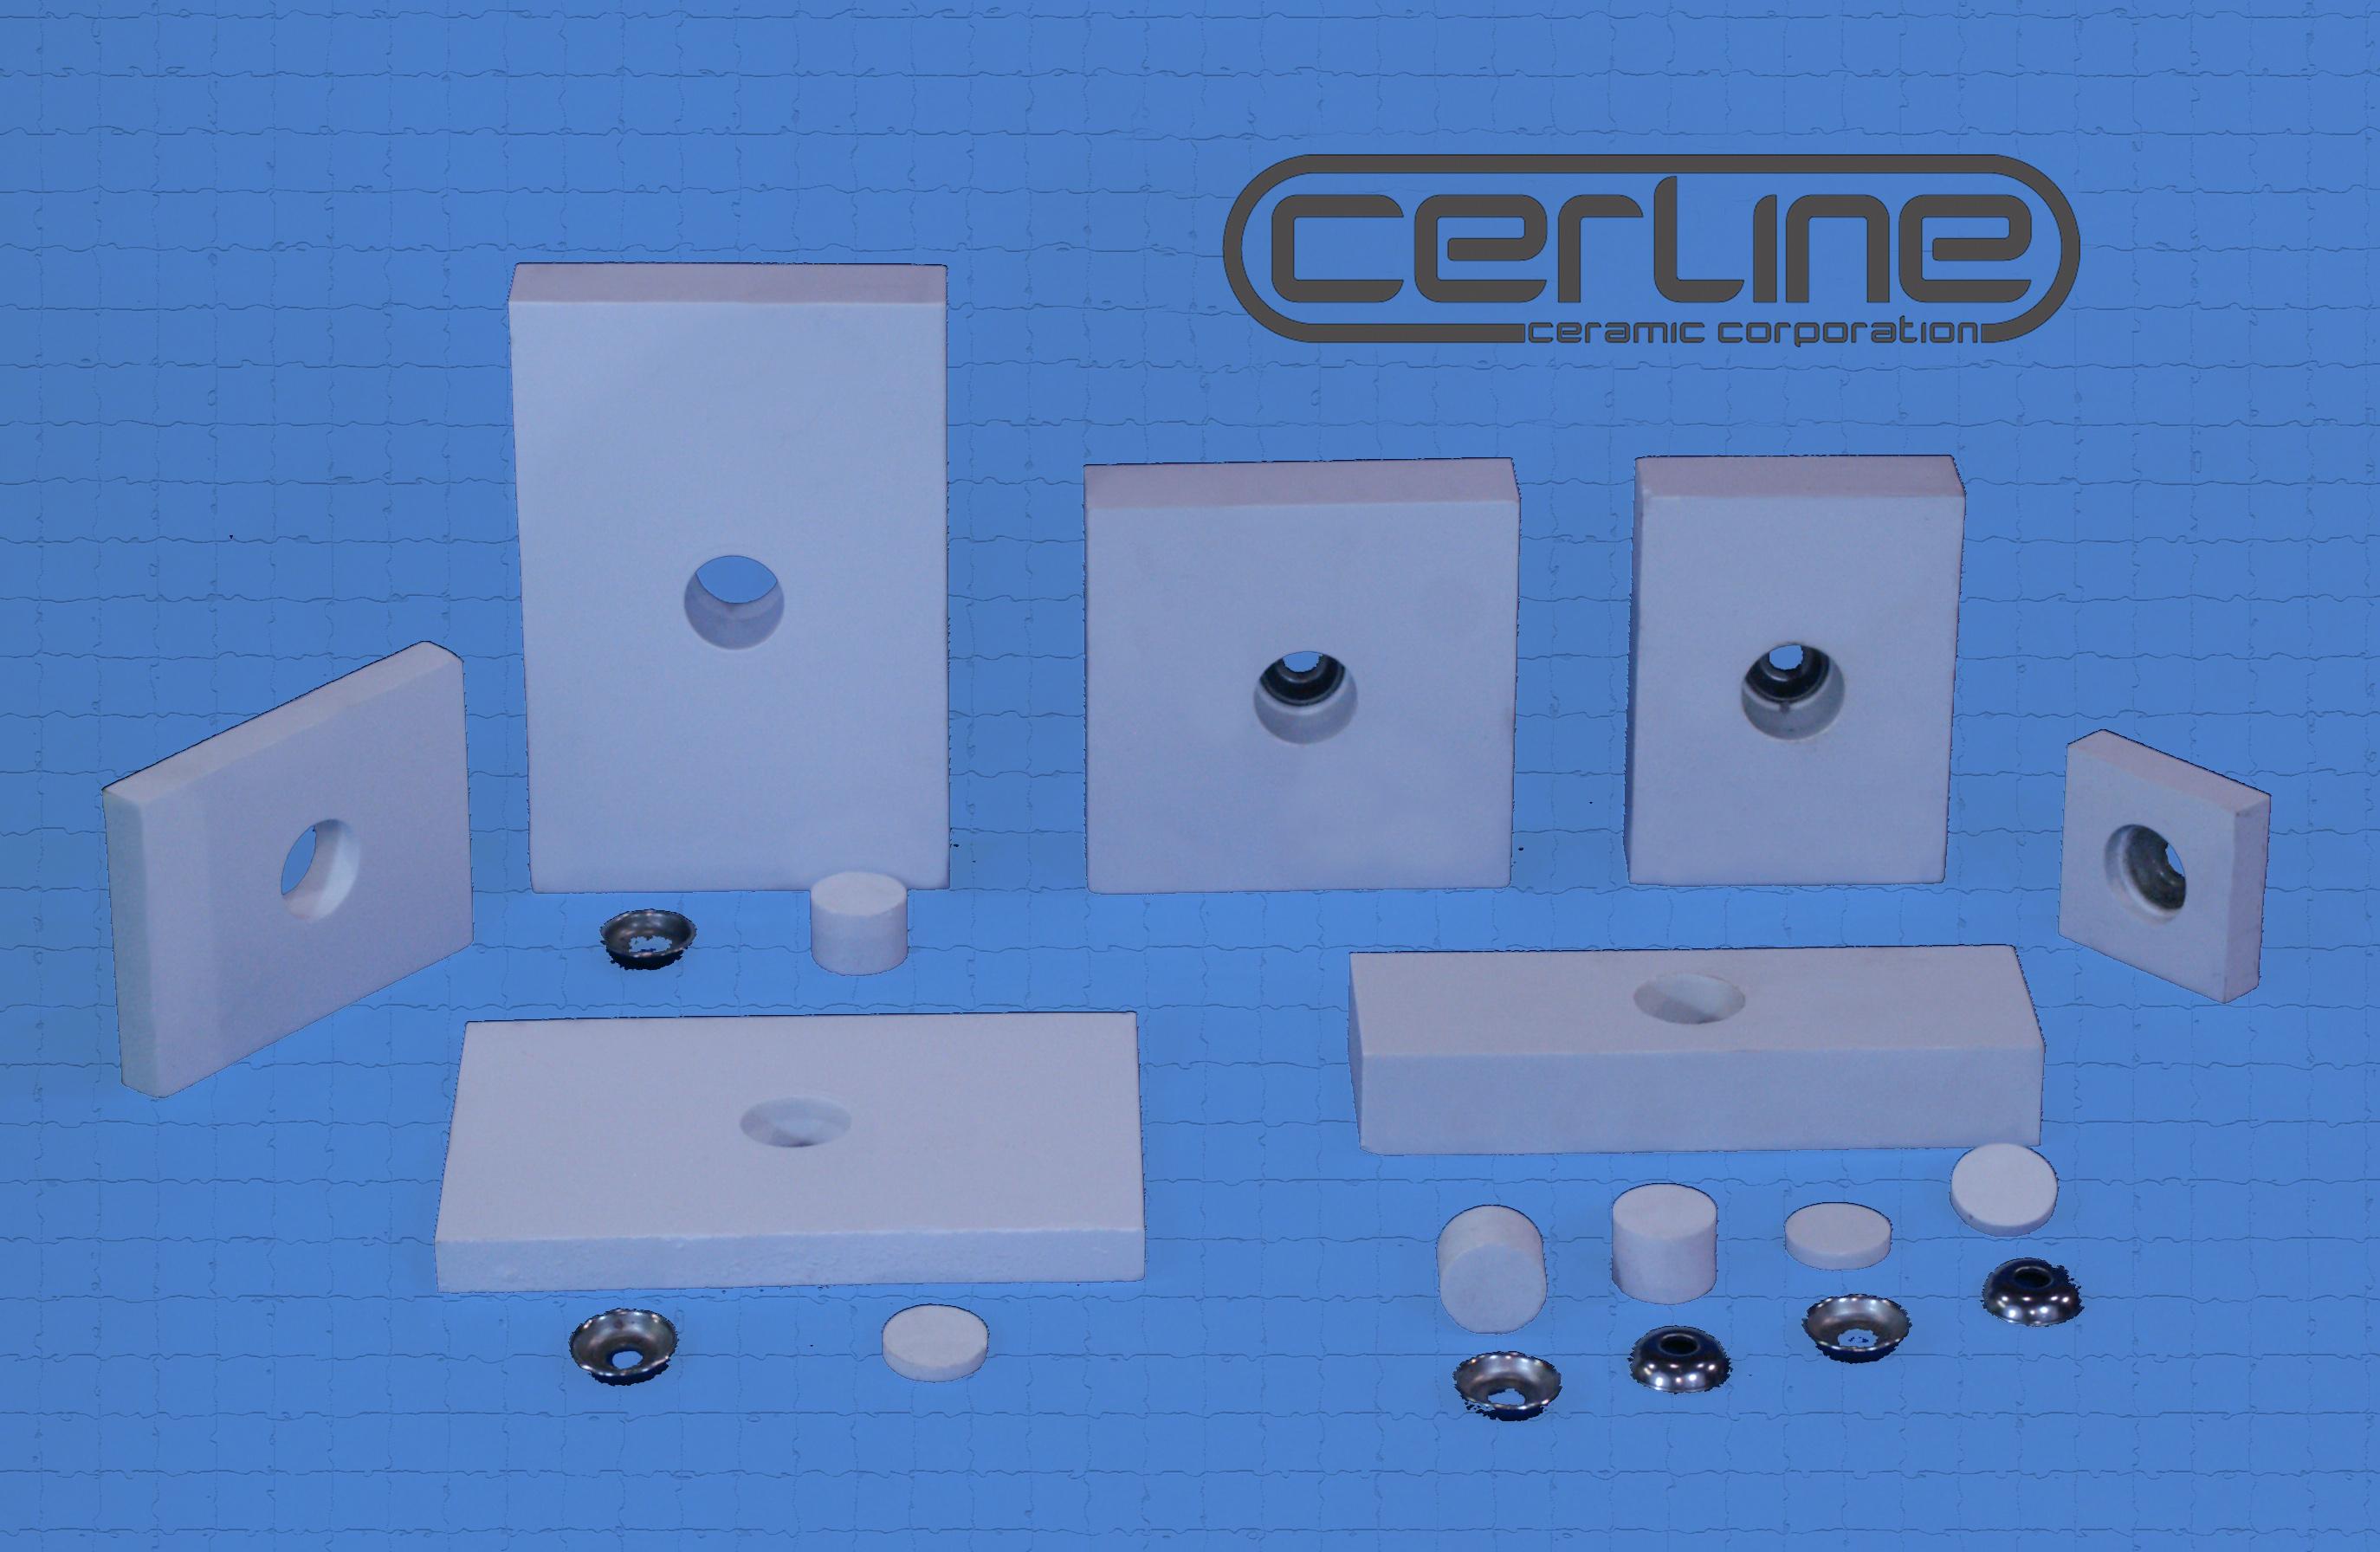 Ceramic Fabricator of Indiana Cerline